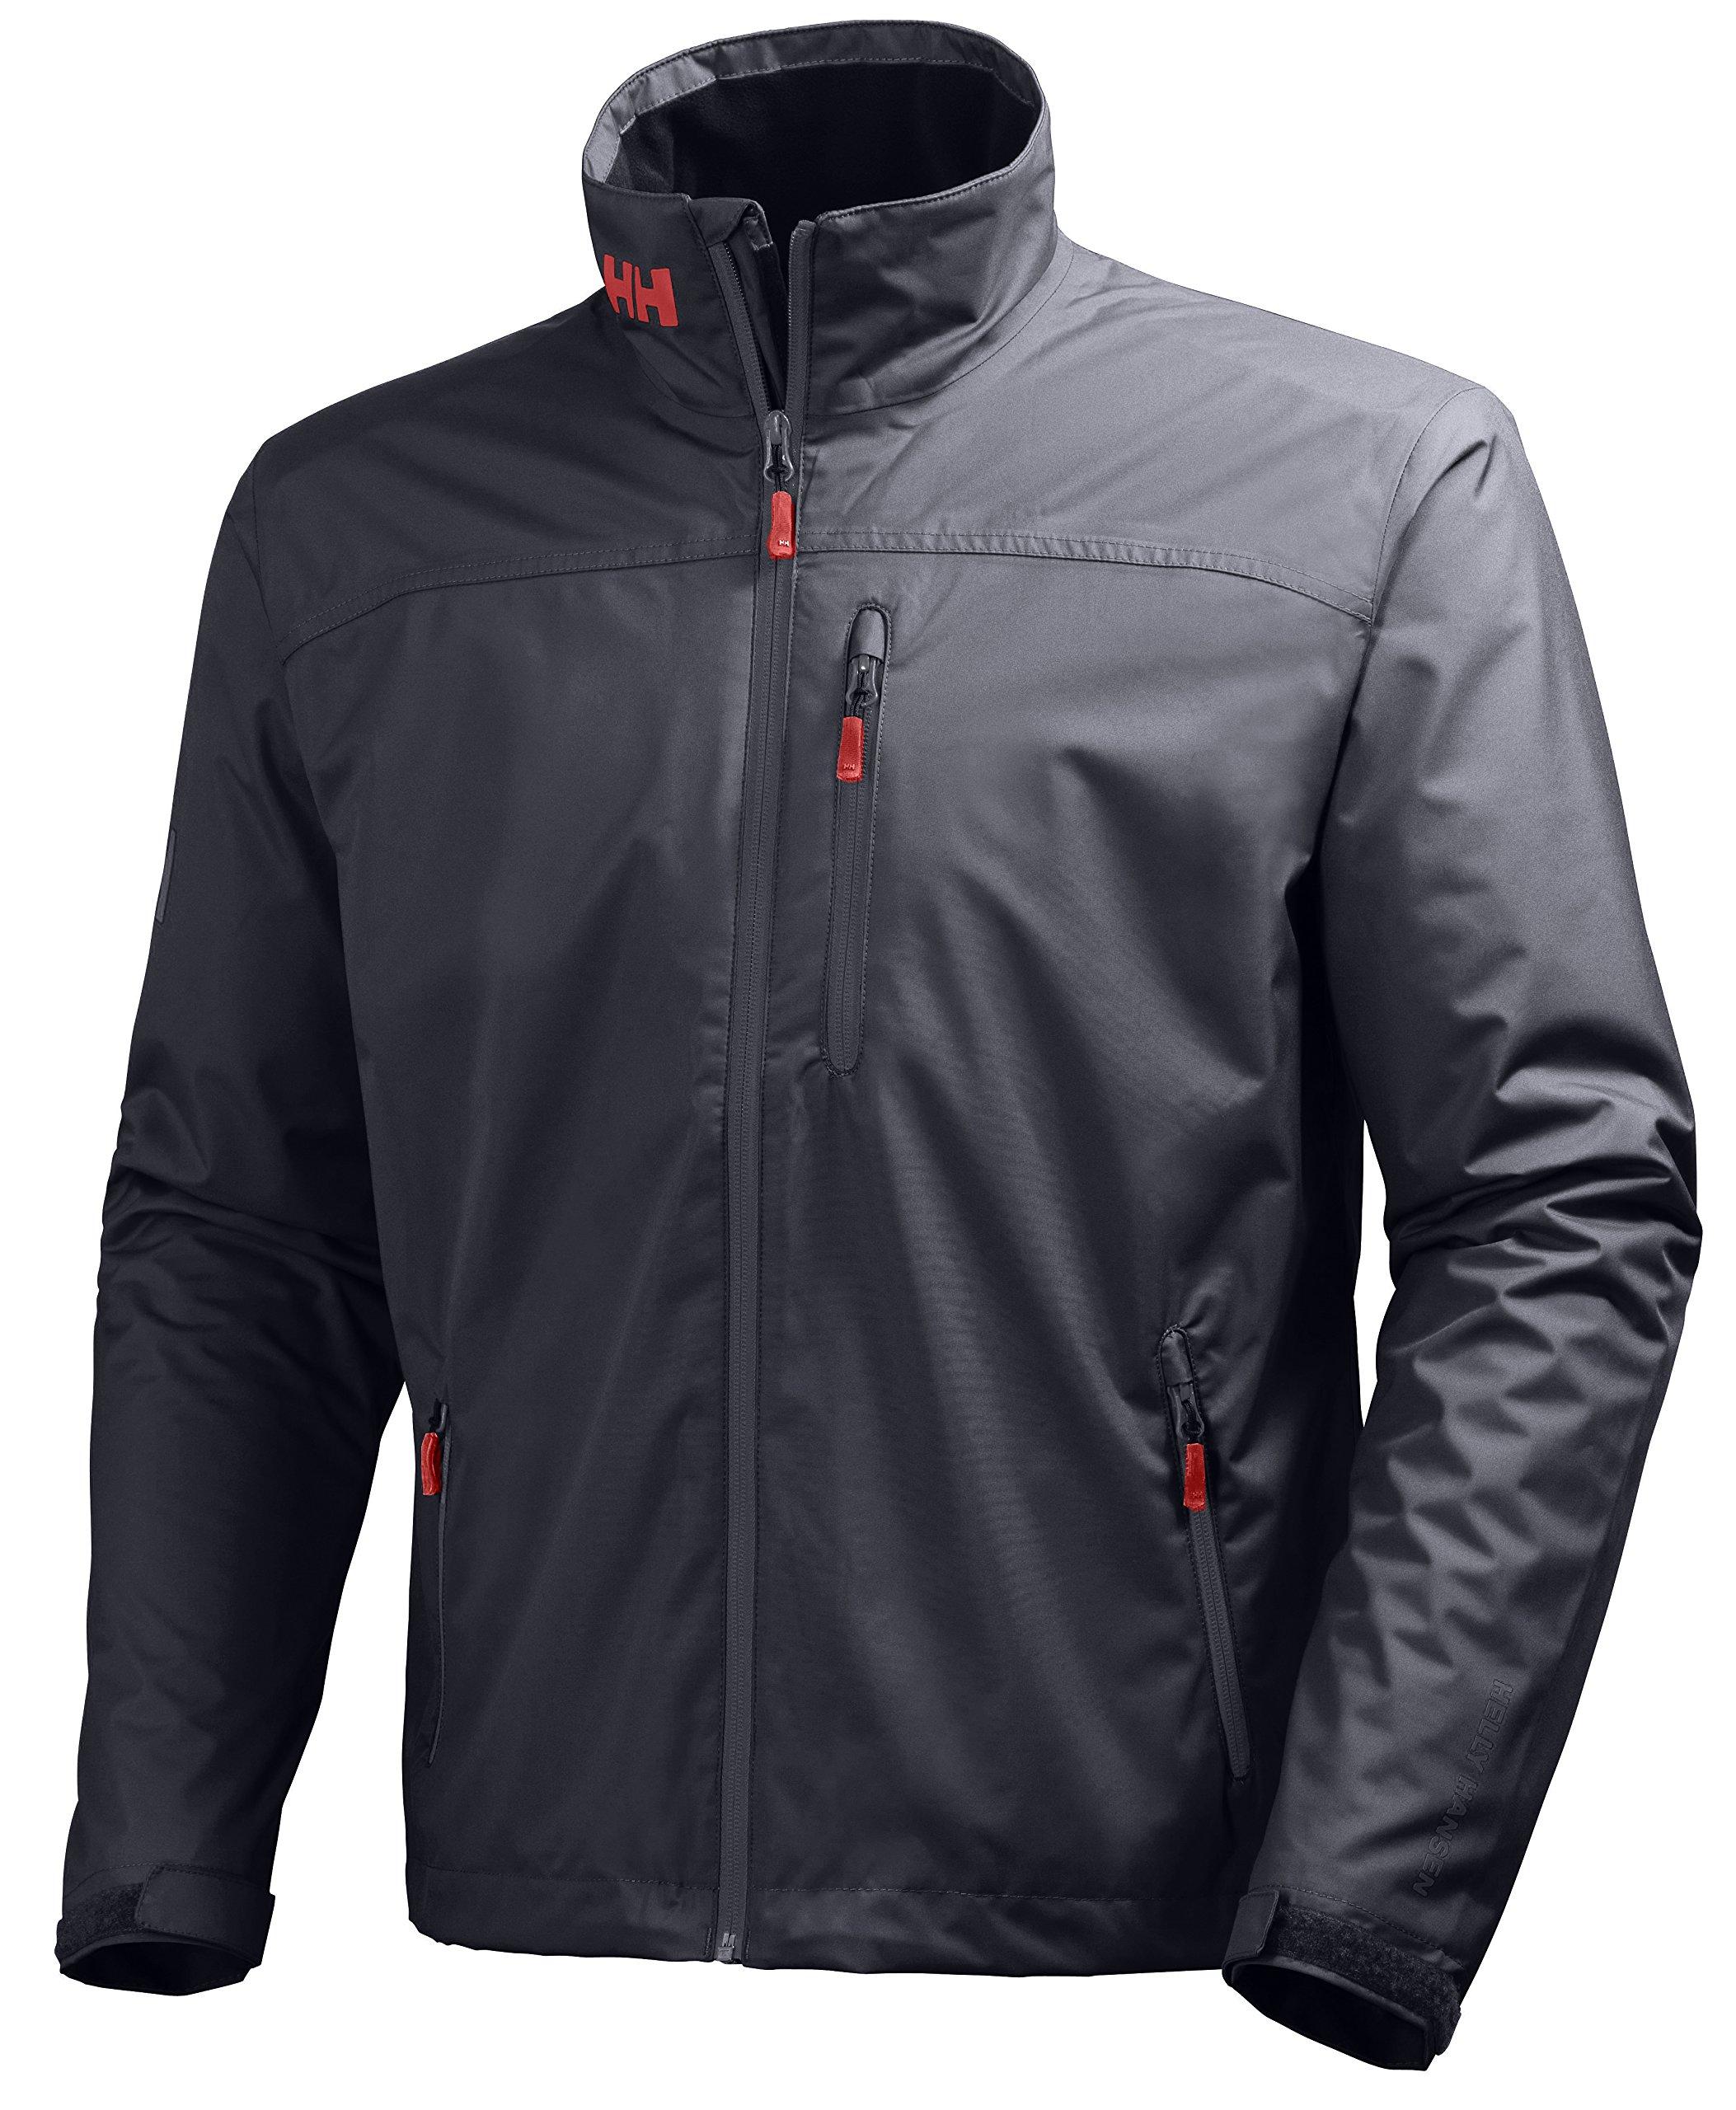 e79d13b20 Best Rated in Men s Outdoor Recreation Jackets   Coats   Helpful ...